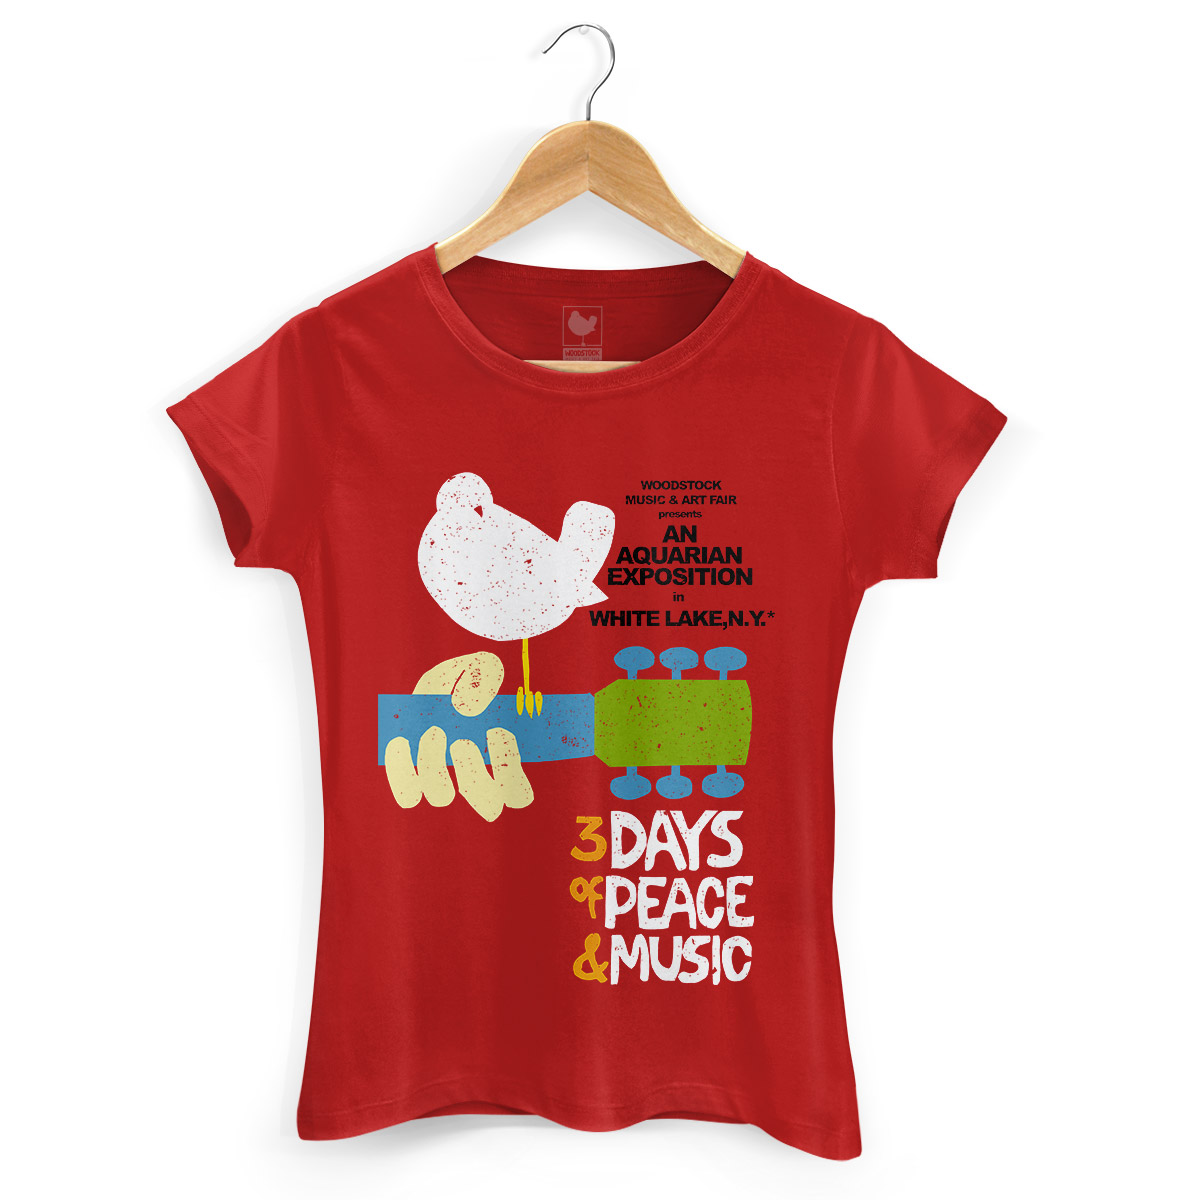 Camiseta Feminina Vermelha Woodstock Poster